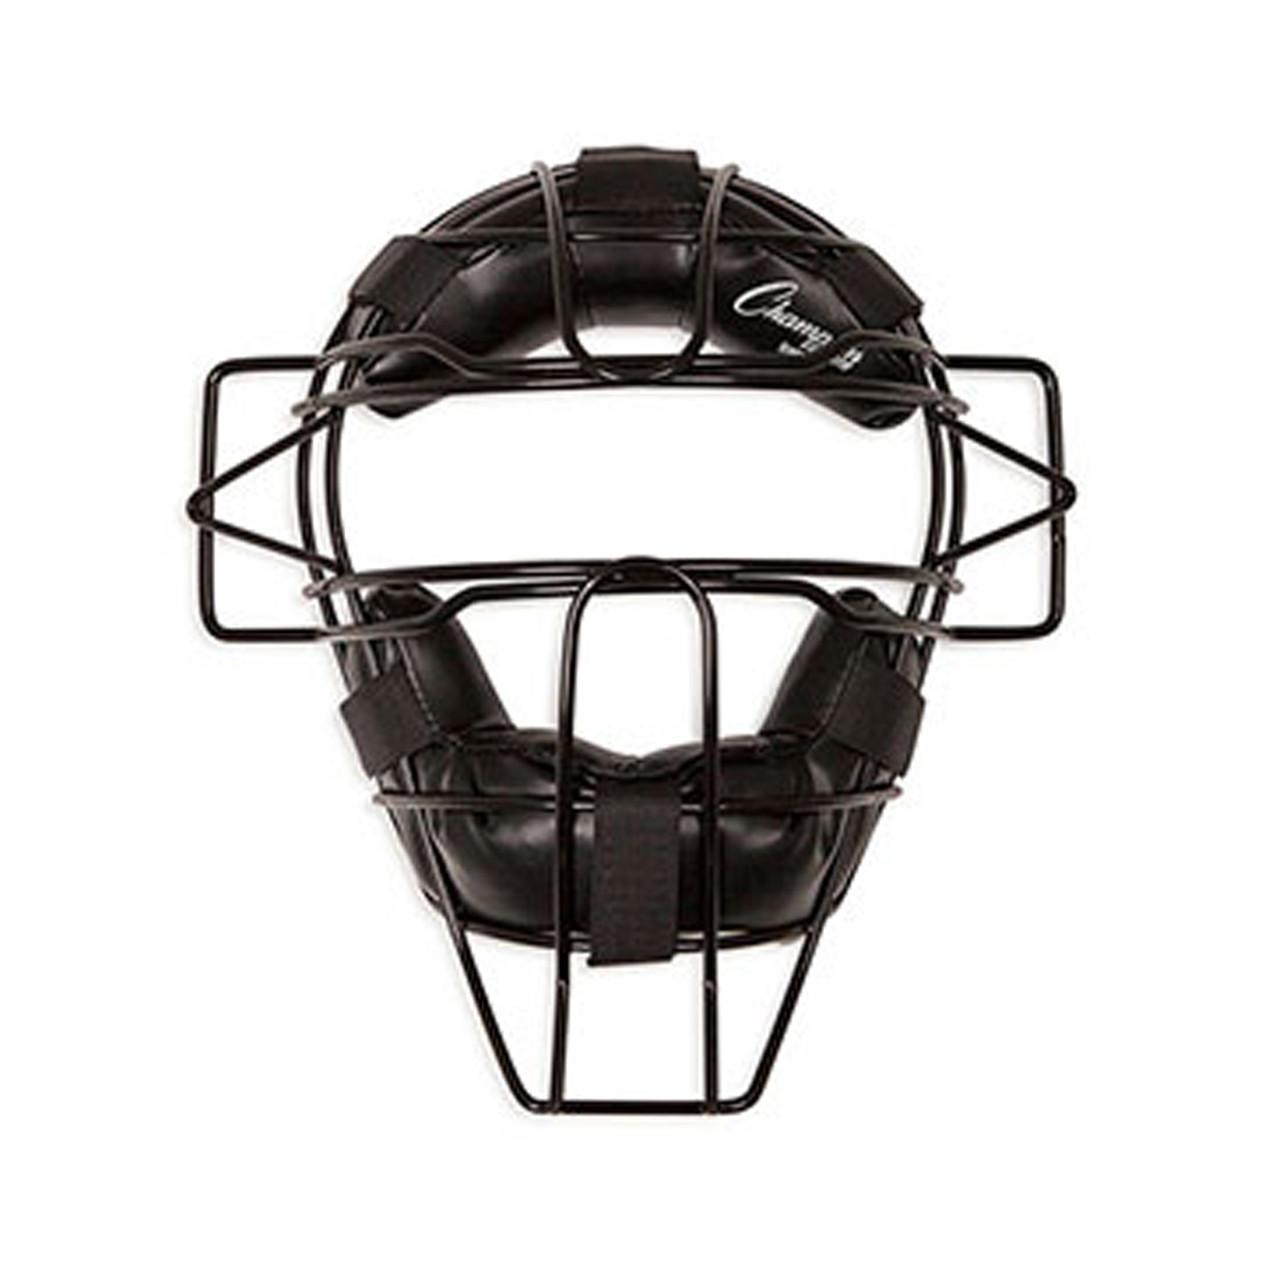 720fca85c21b Champion Adult Umpire Mask - Black